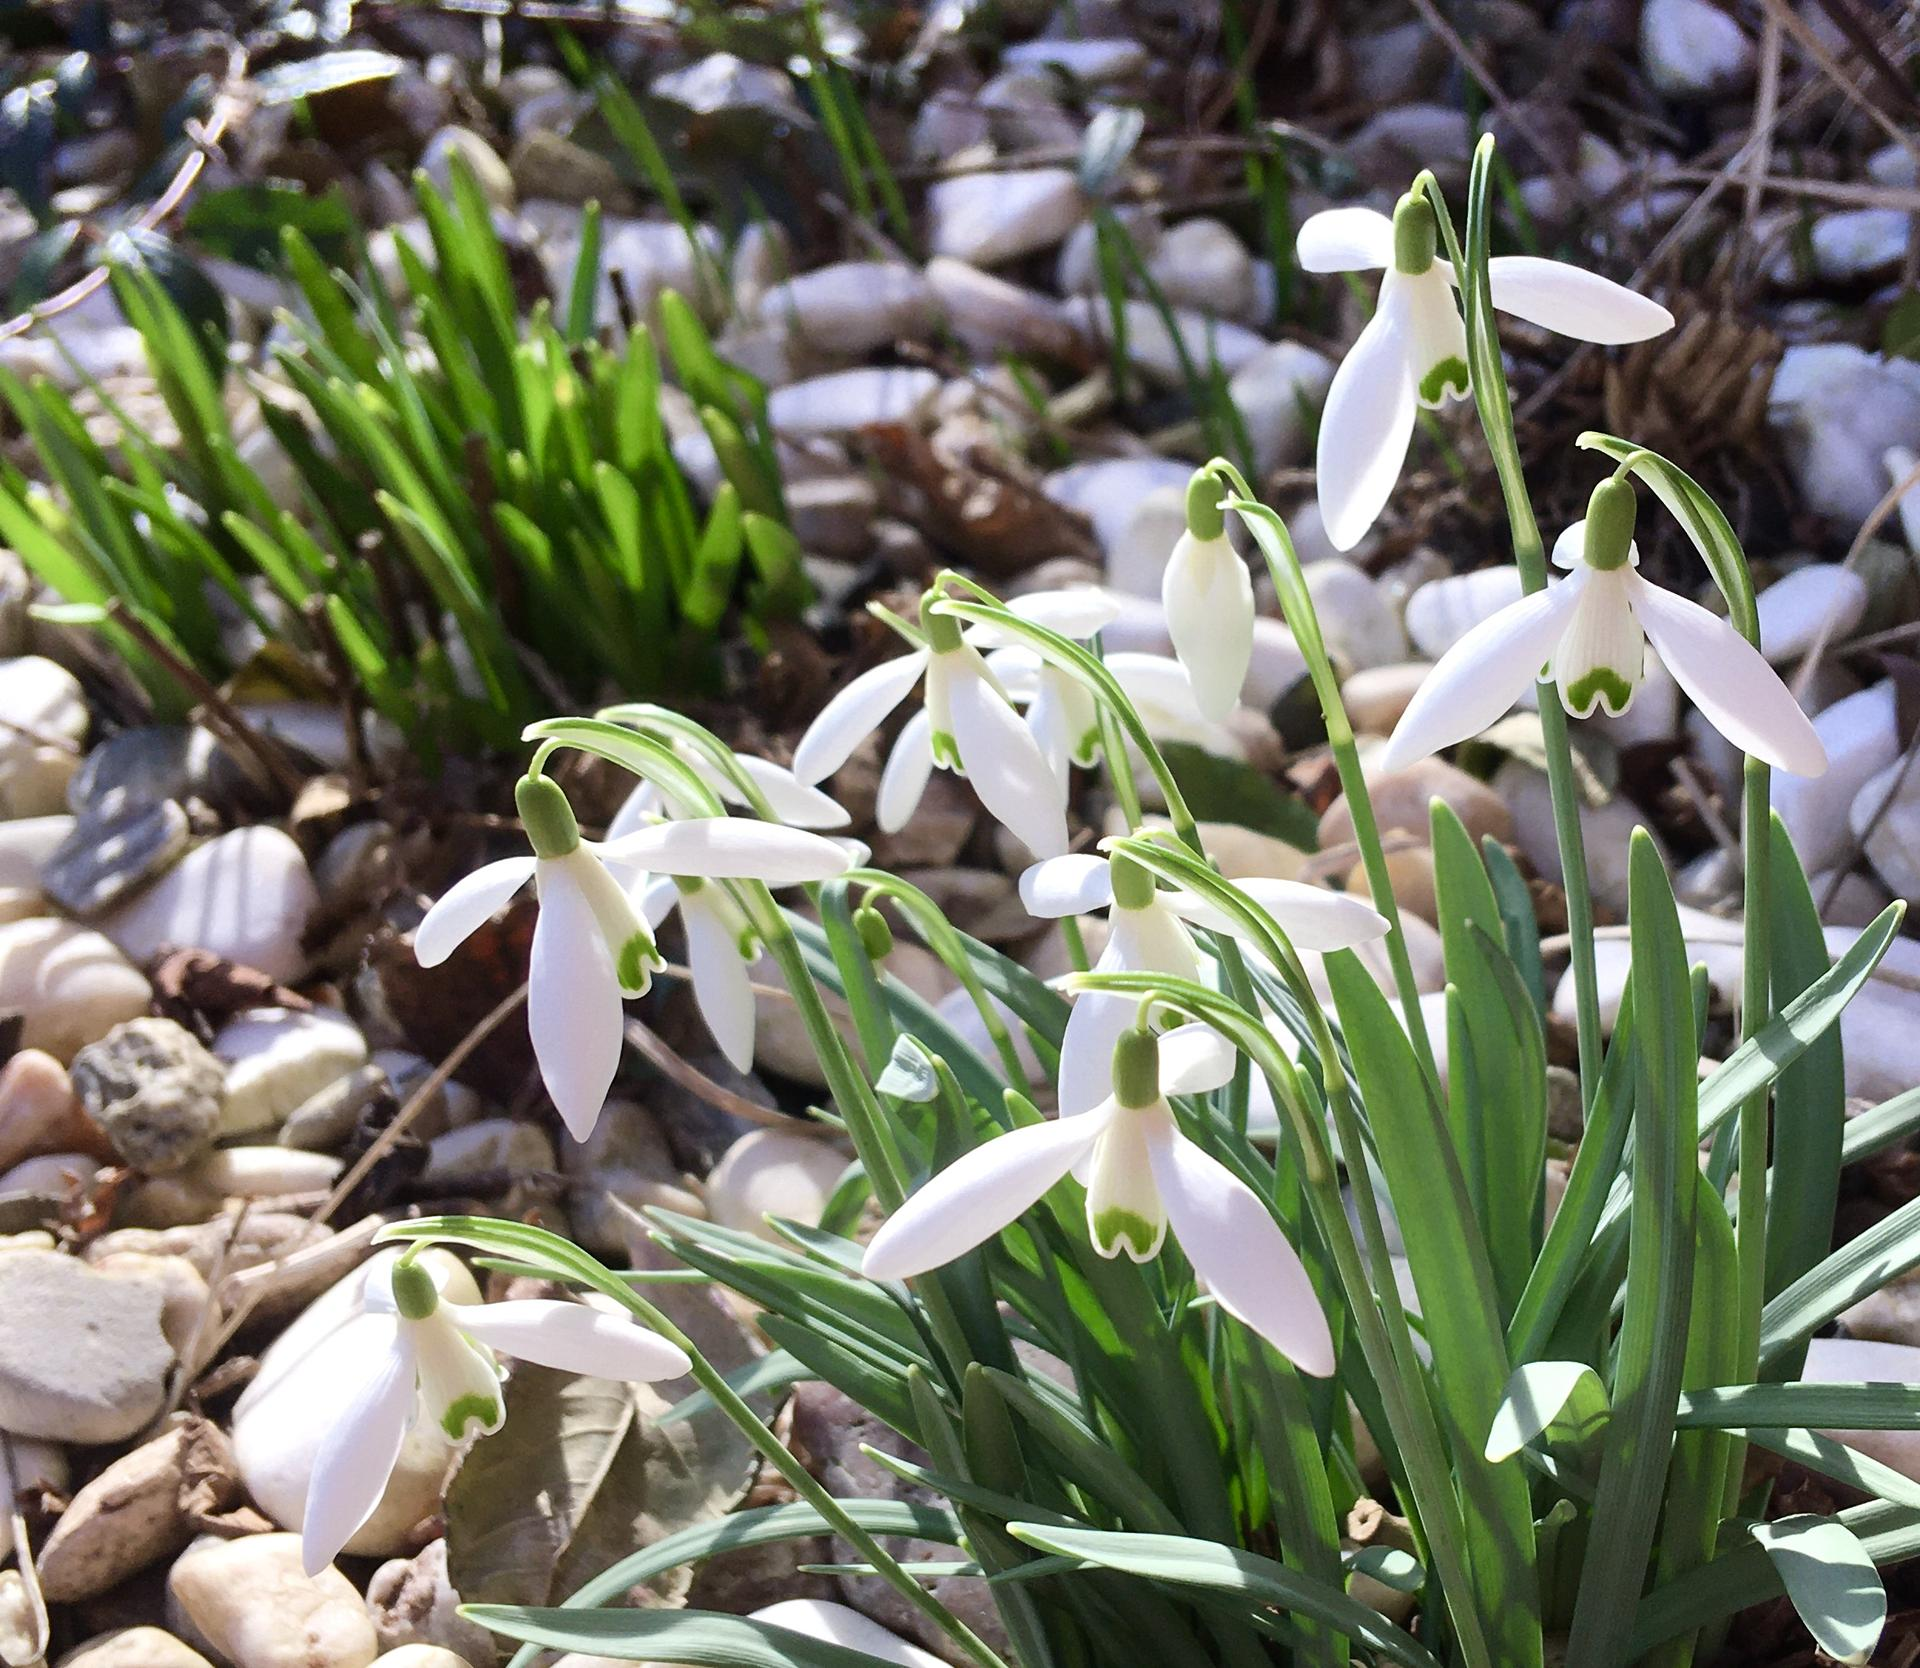 Zahrada 2020 - Uz se da na zahrade najit i dvojity jarni zaber 🤗